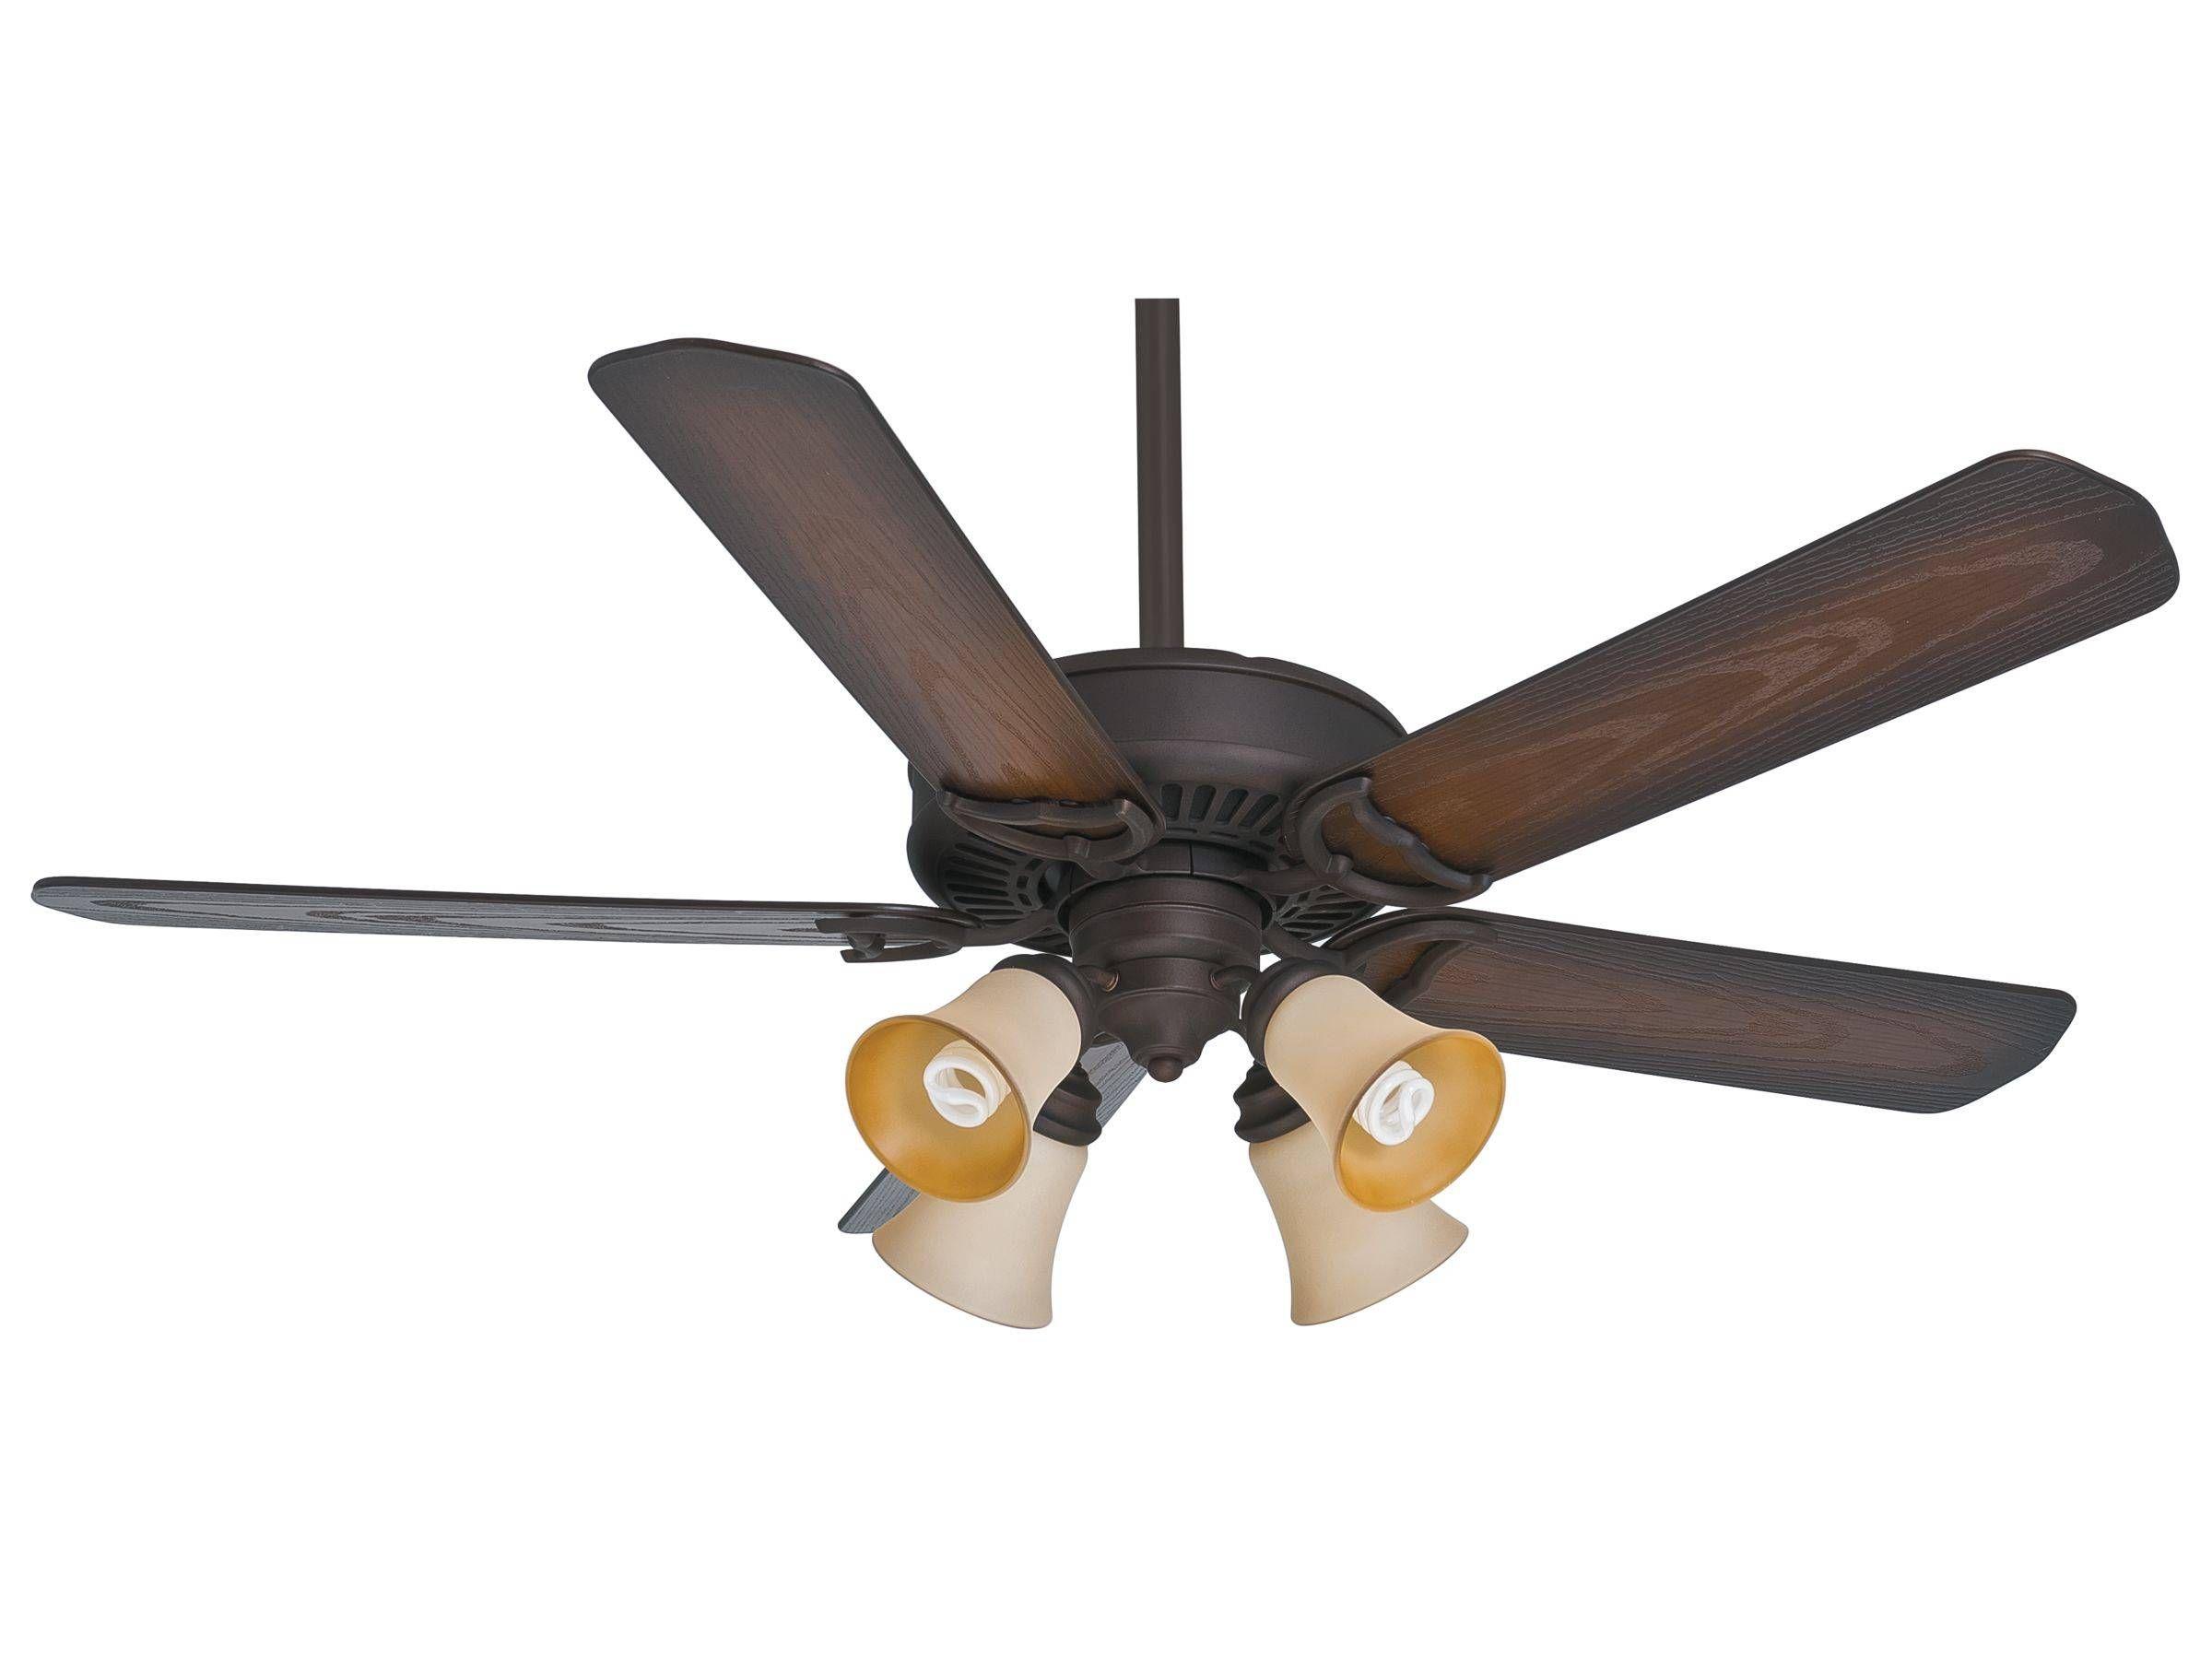 Casablanca Panamagallery Ca 55060 Airflow Rating 0 Cfm Cubic Feet Per Minute Ceiling Fan Bronze Ceiling Fan Outdoor Ceiling Fans